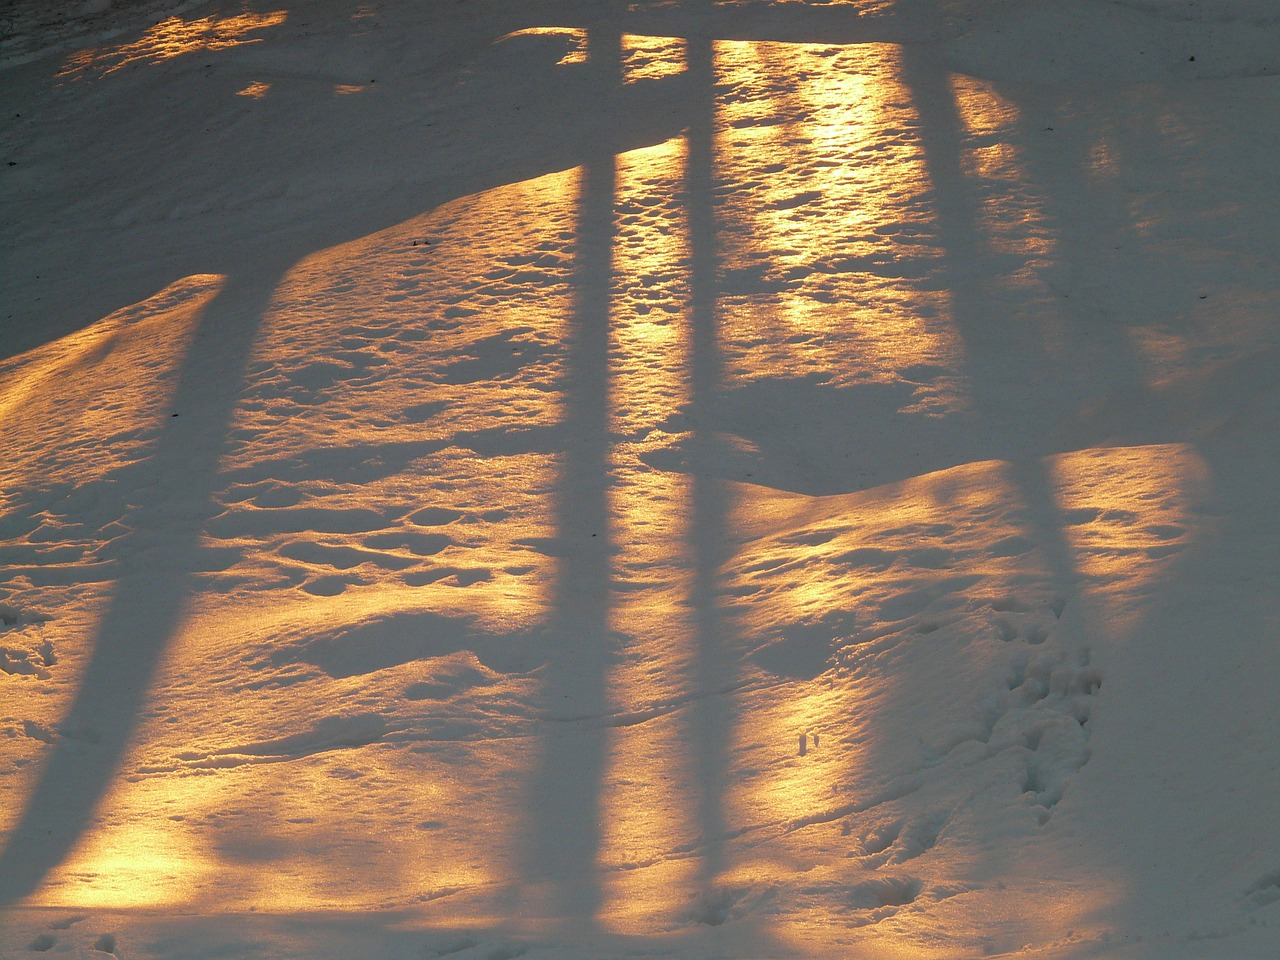 sunlight reflected on snow